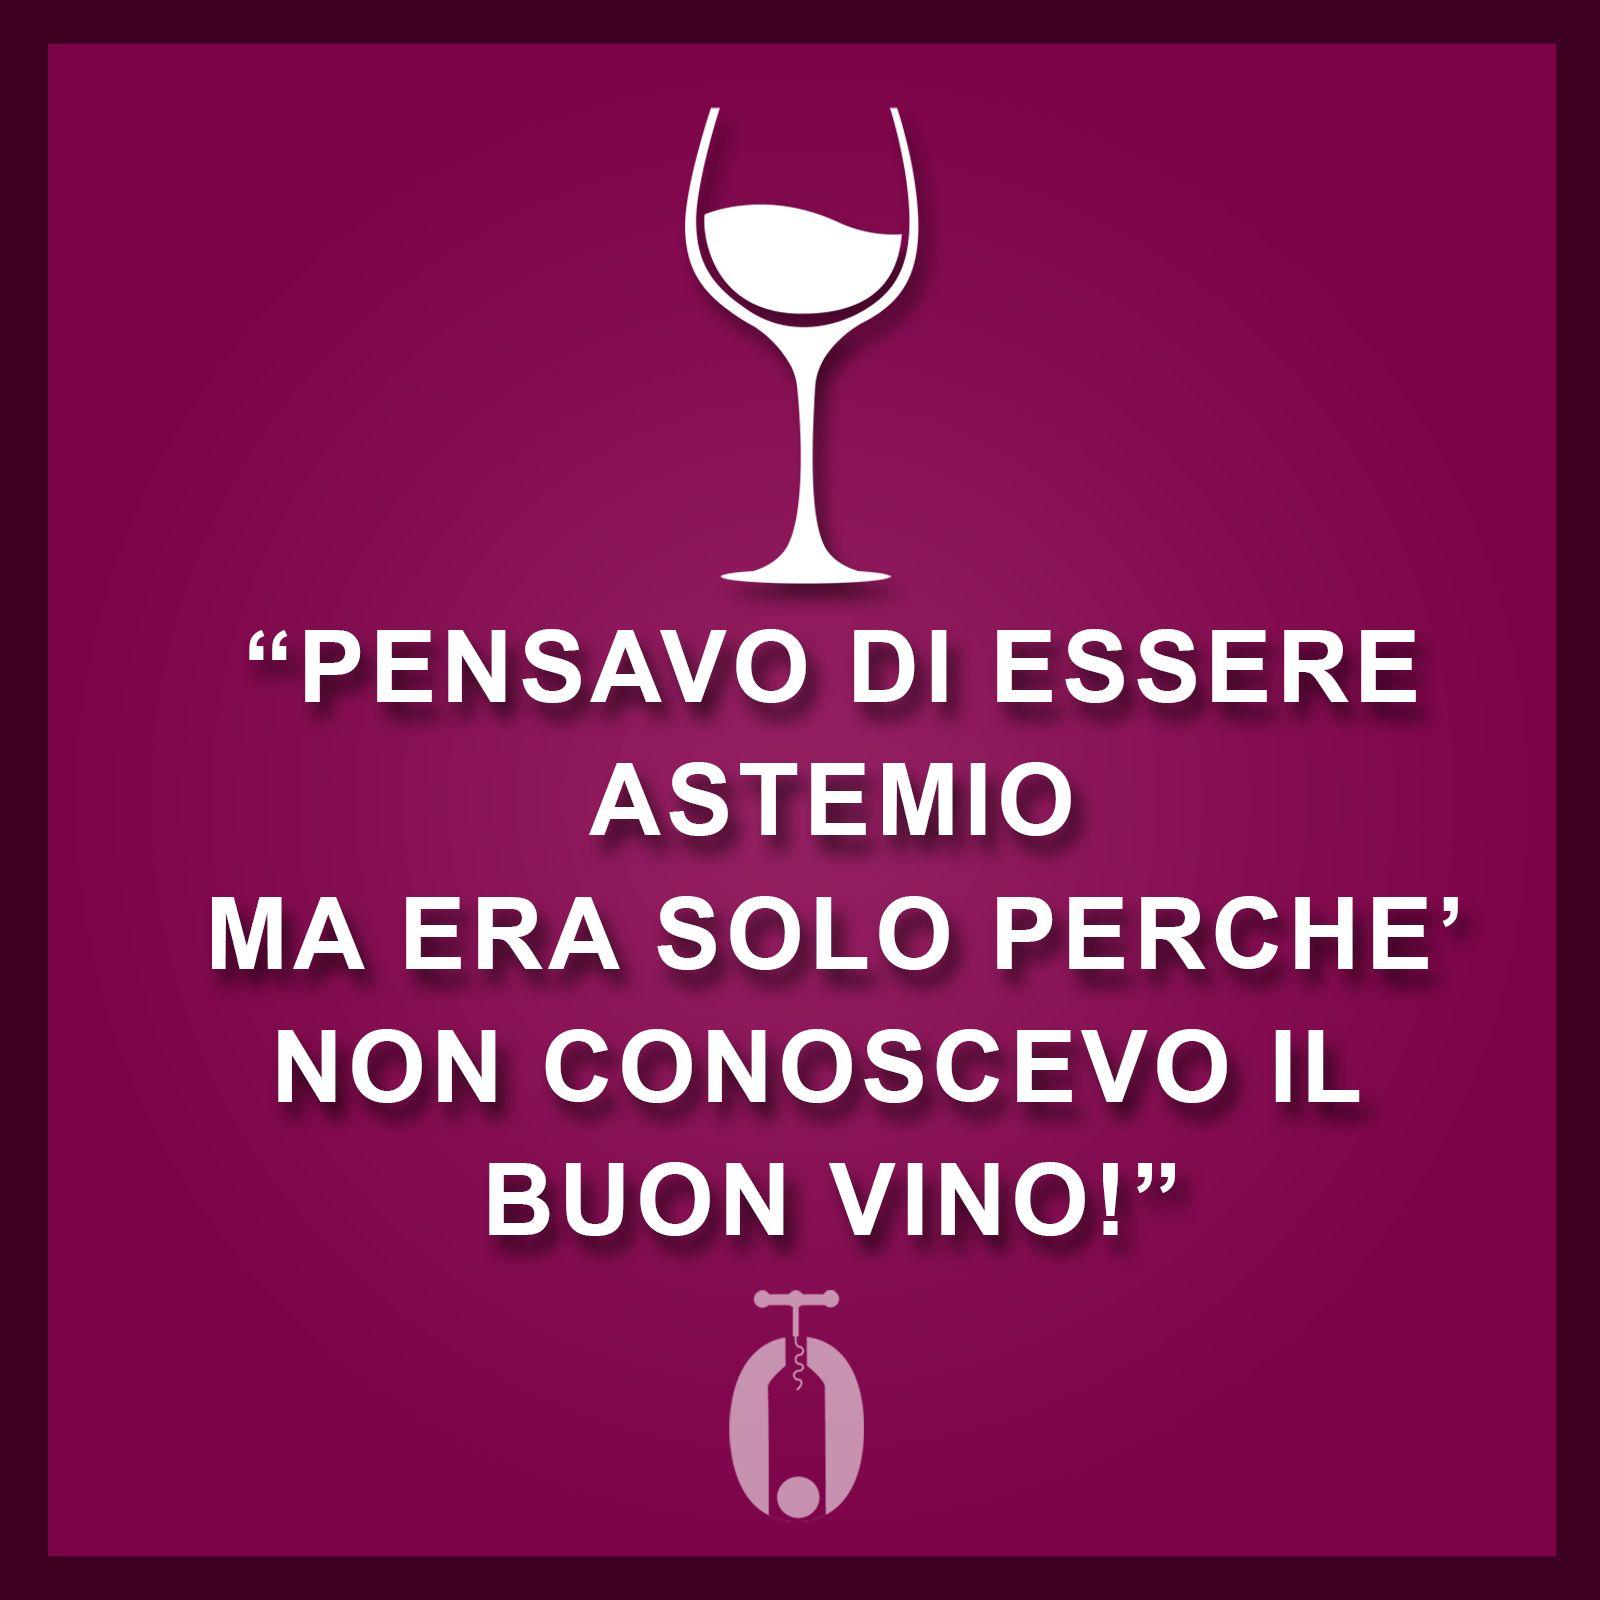 Enoteca Online Vendita Vino Online Vino Citazioni Sul Vino